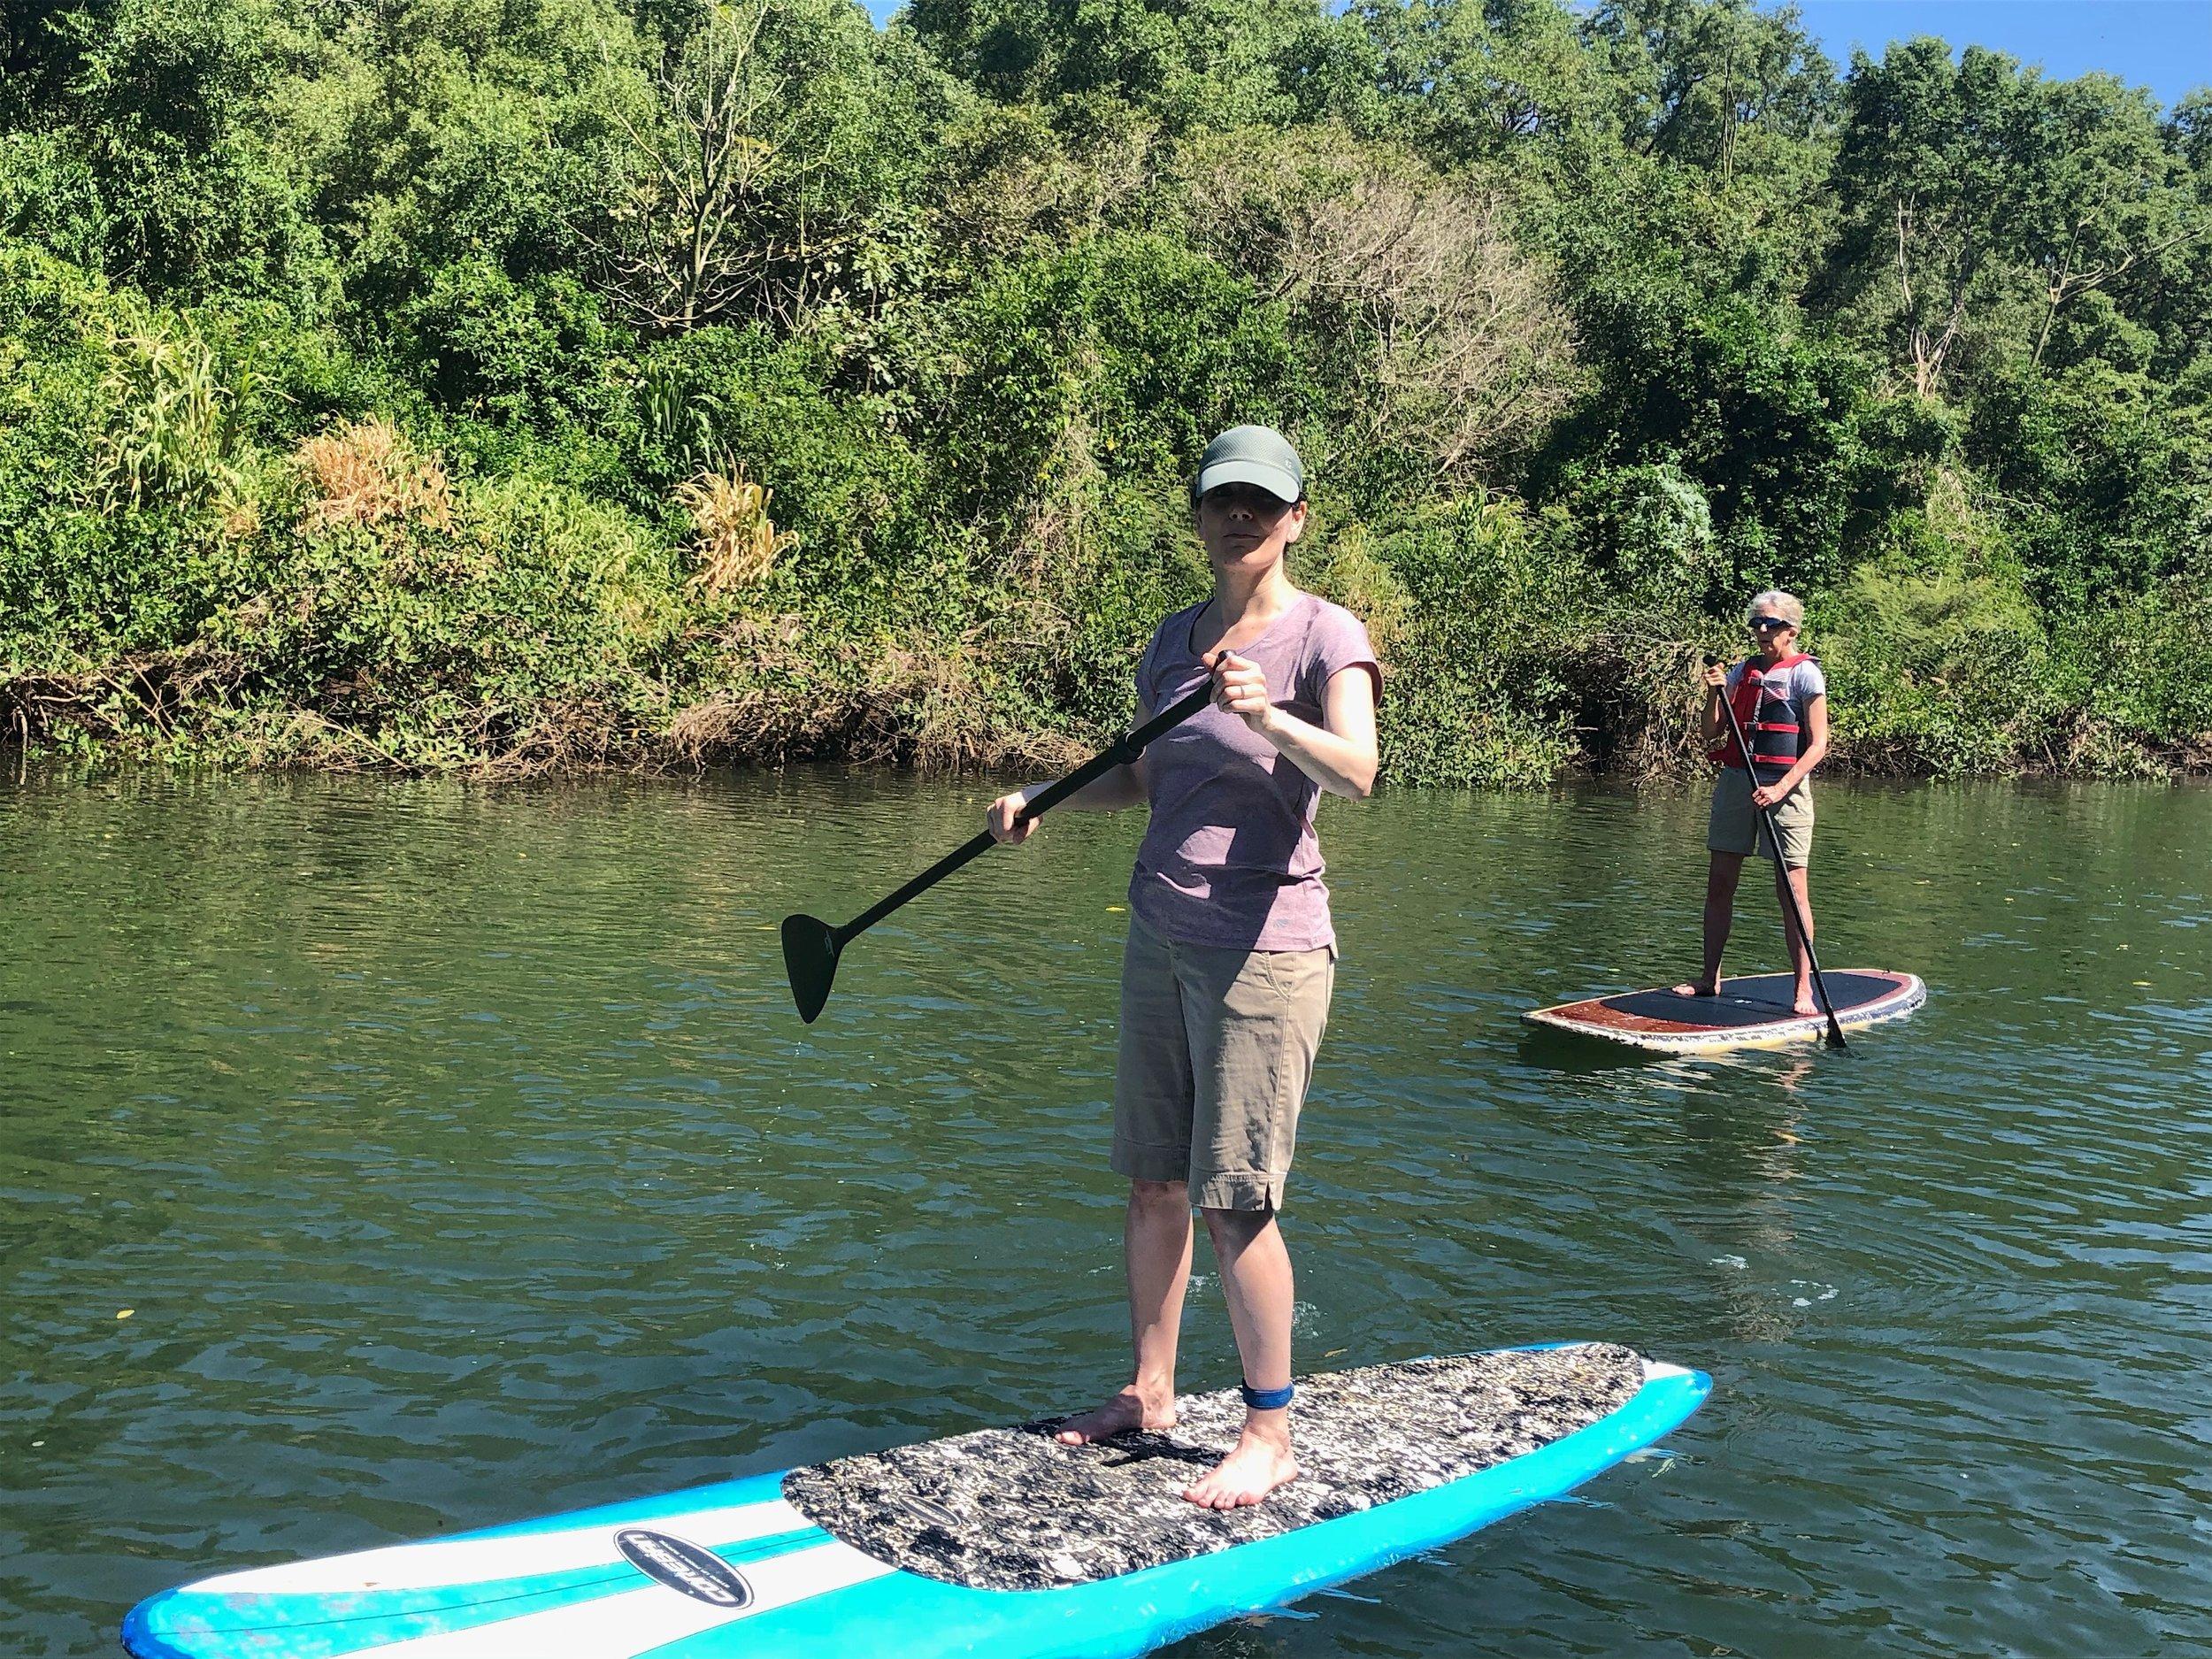 paddle boarding.jpeg